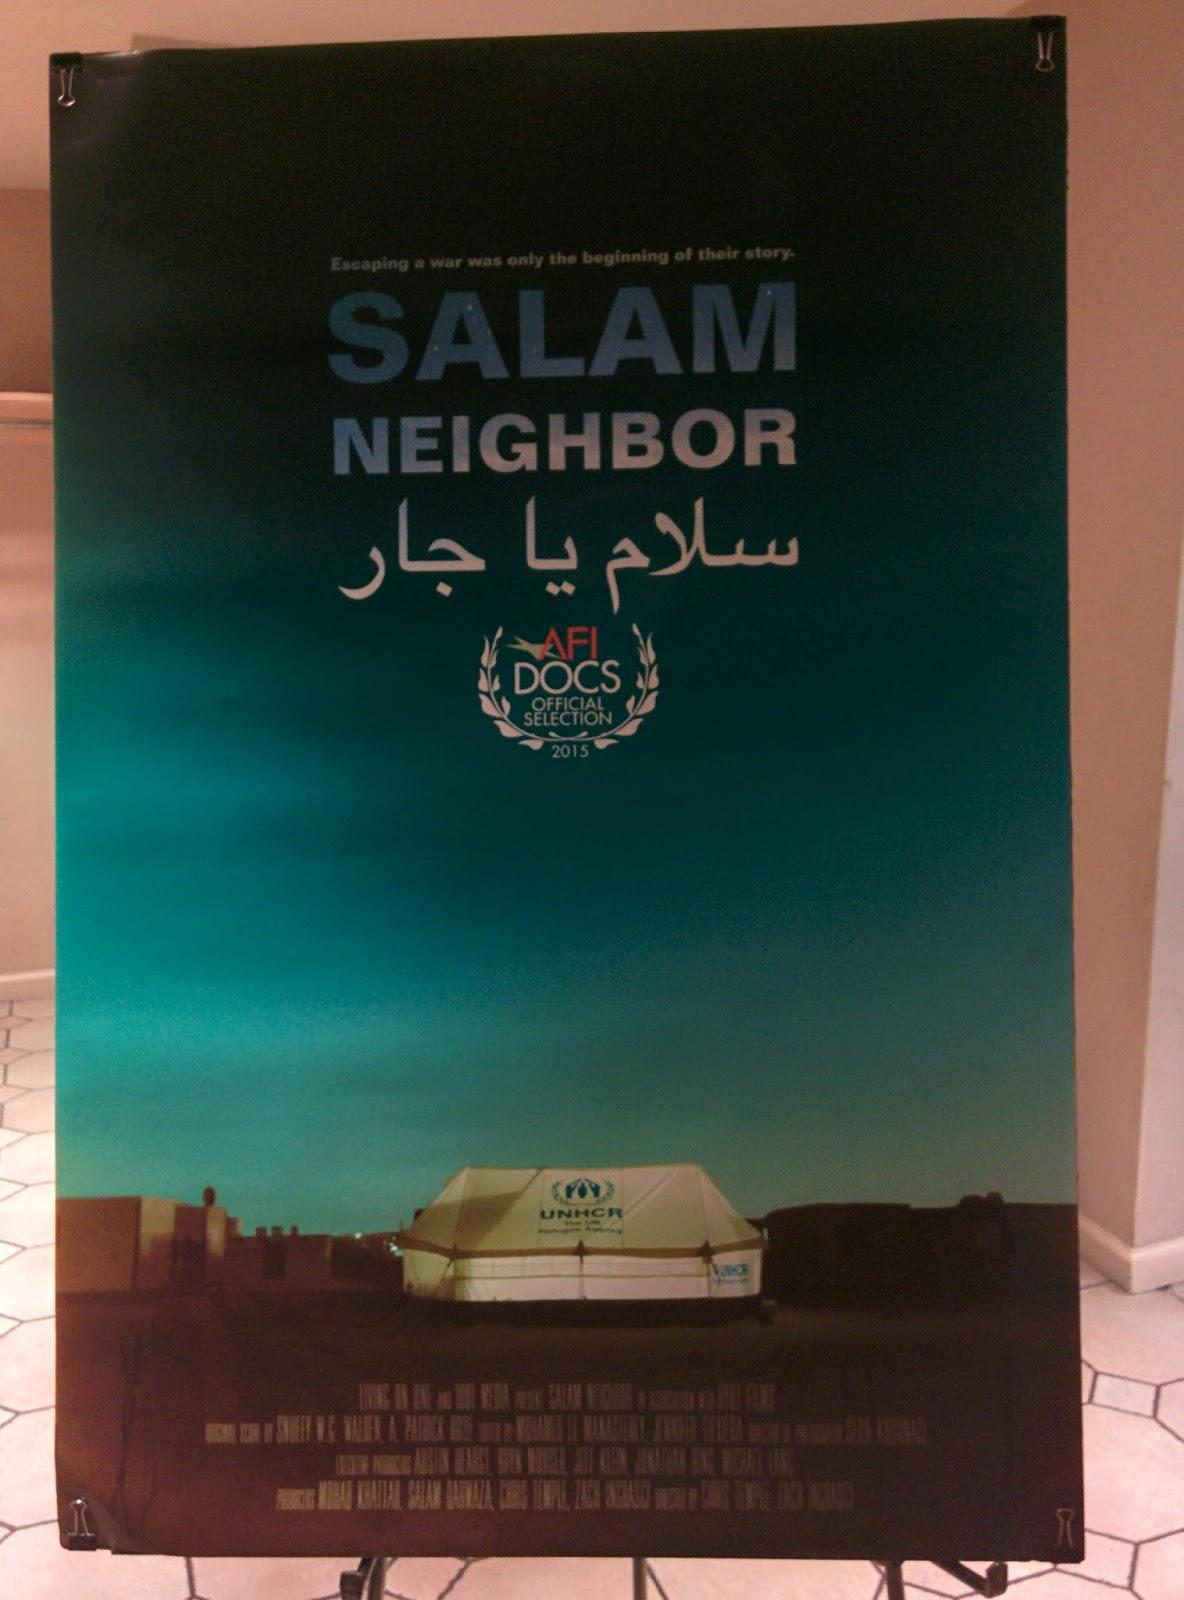 Salam Neighbor 2015